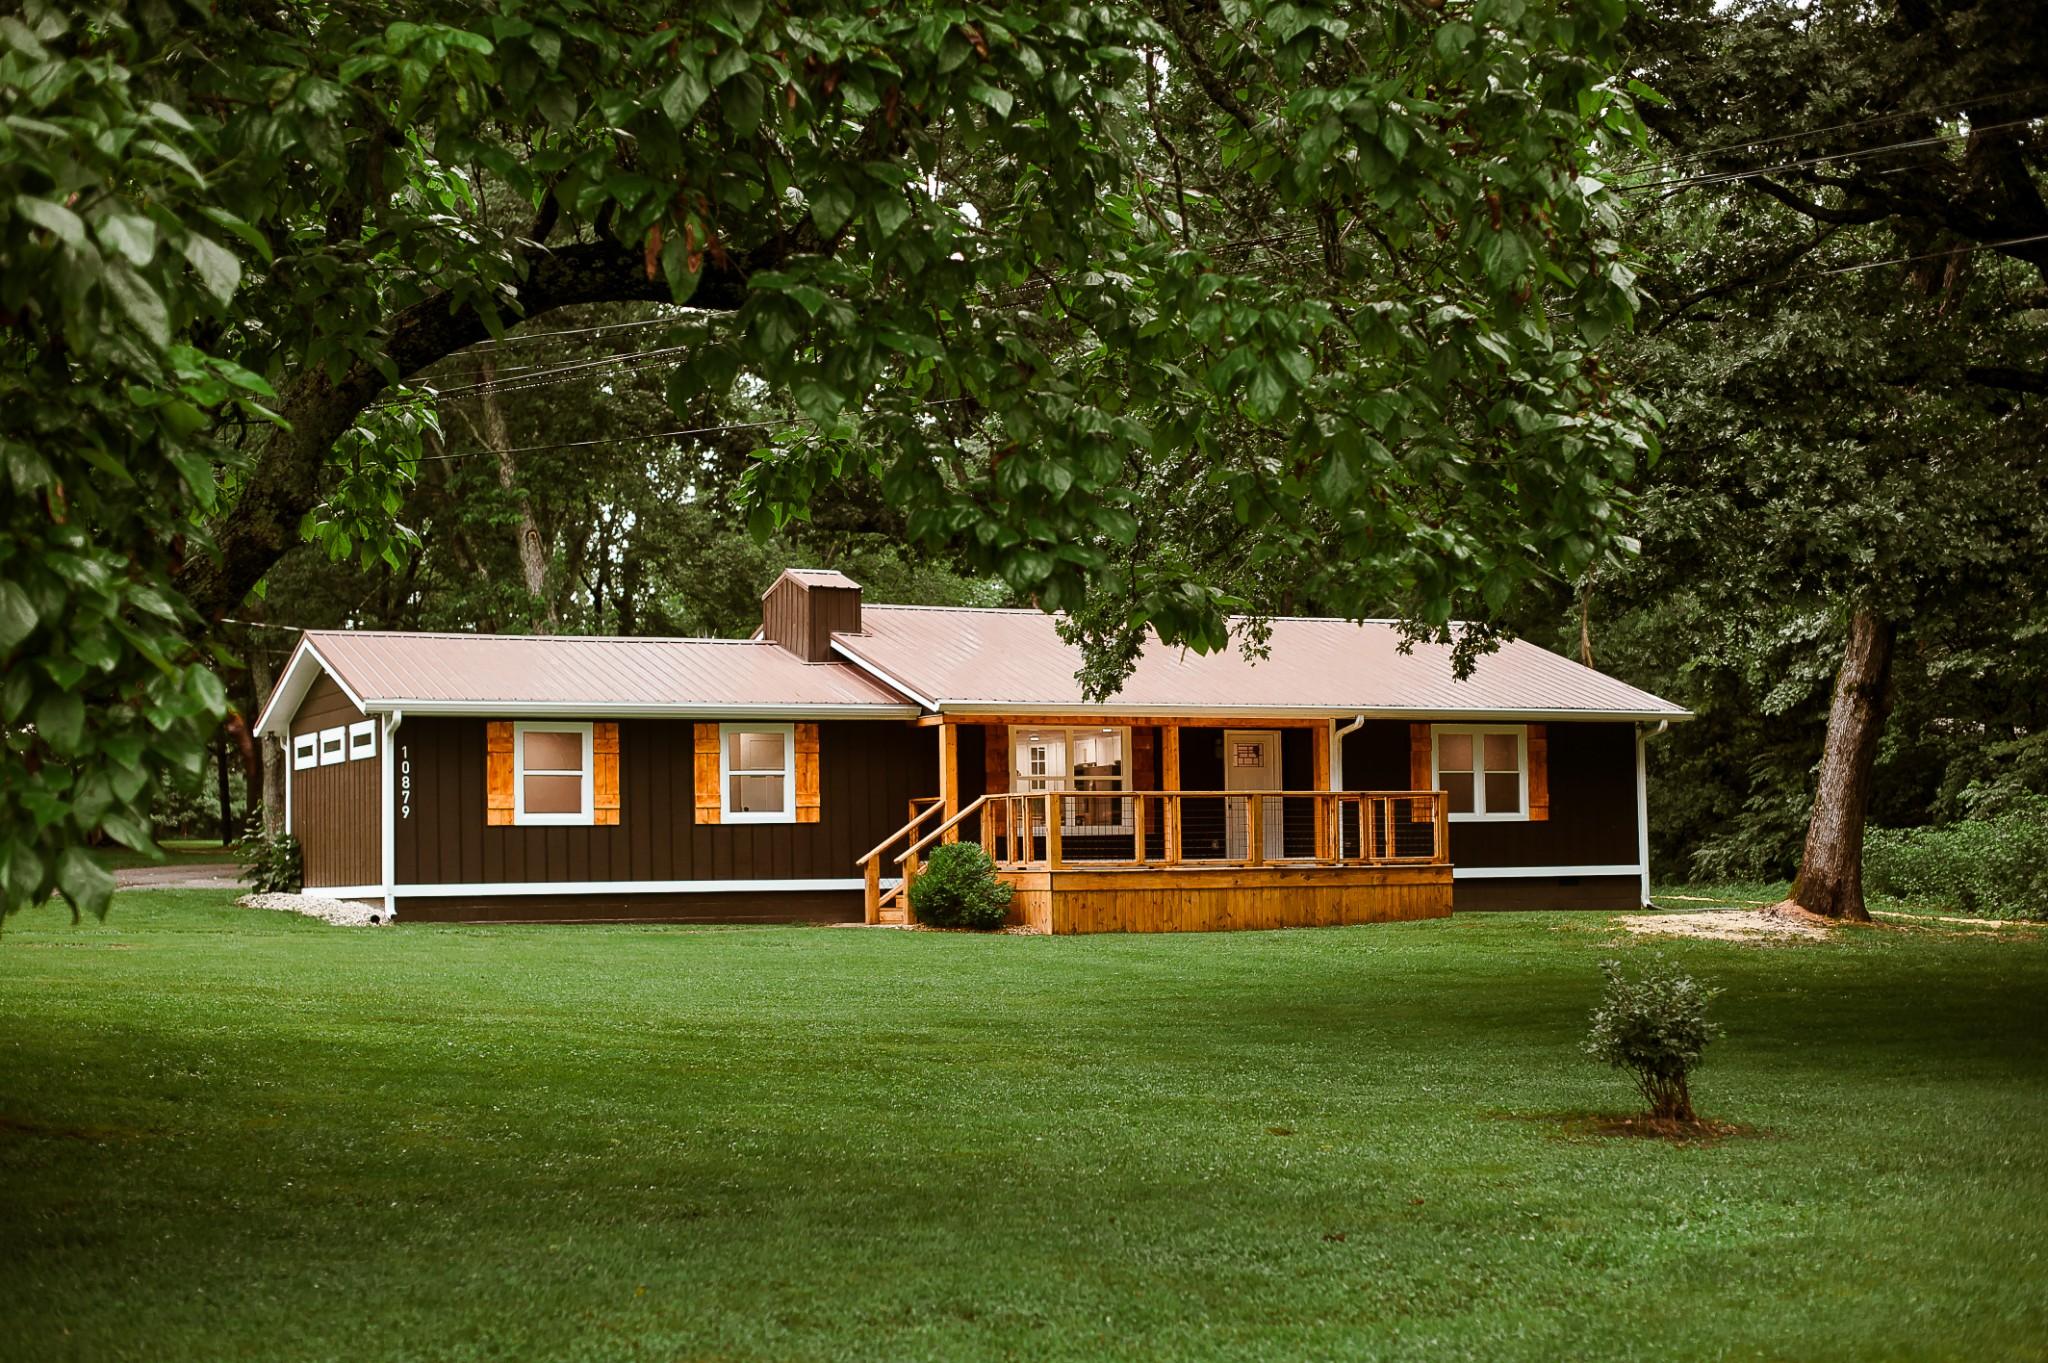 10879 US 41 Property Photo - Monteagle, TN real estate listing